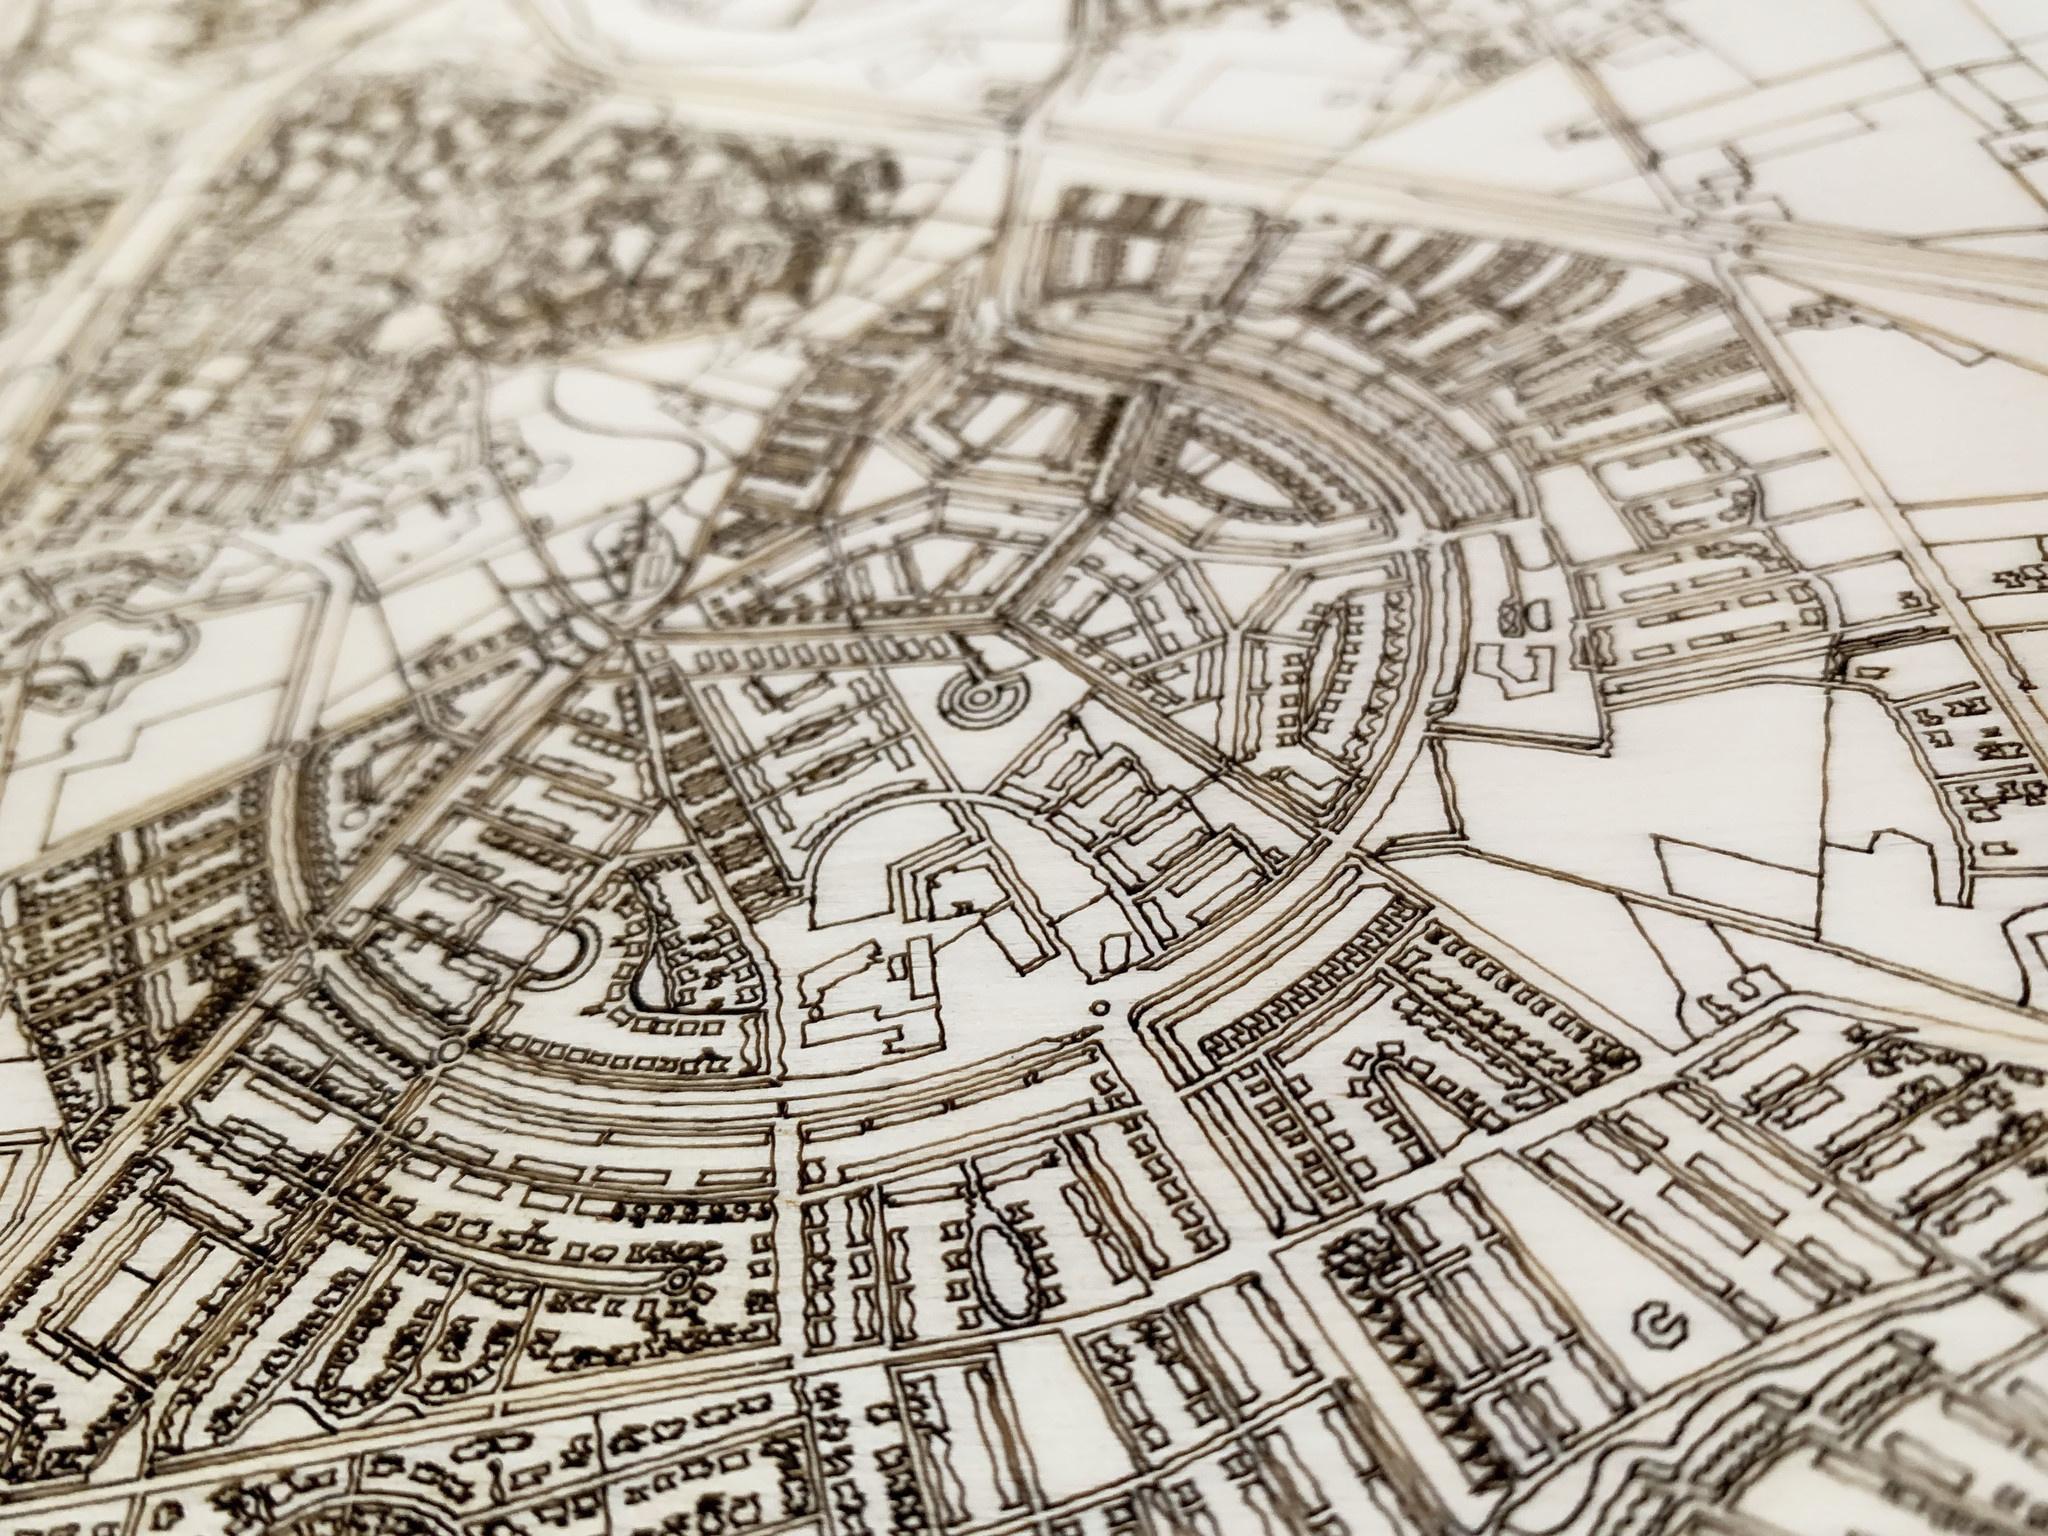 Citymap Groenlo | houten wanddecoratie-4